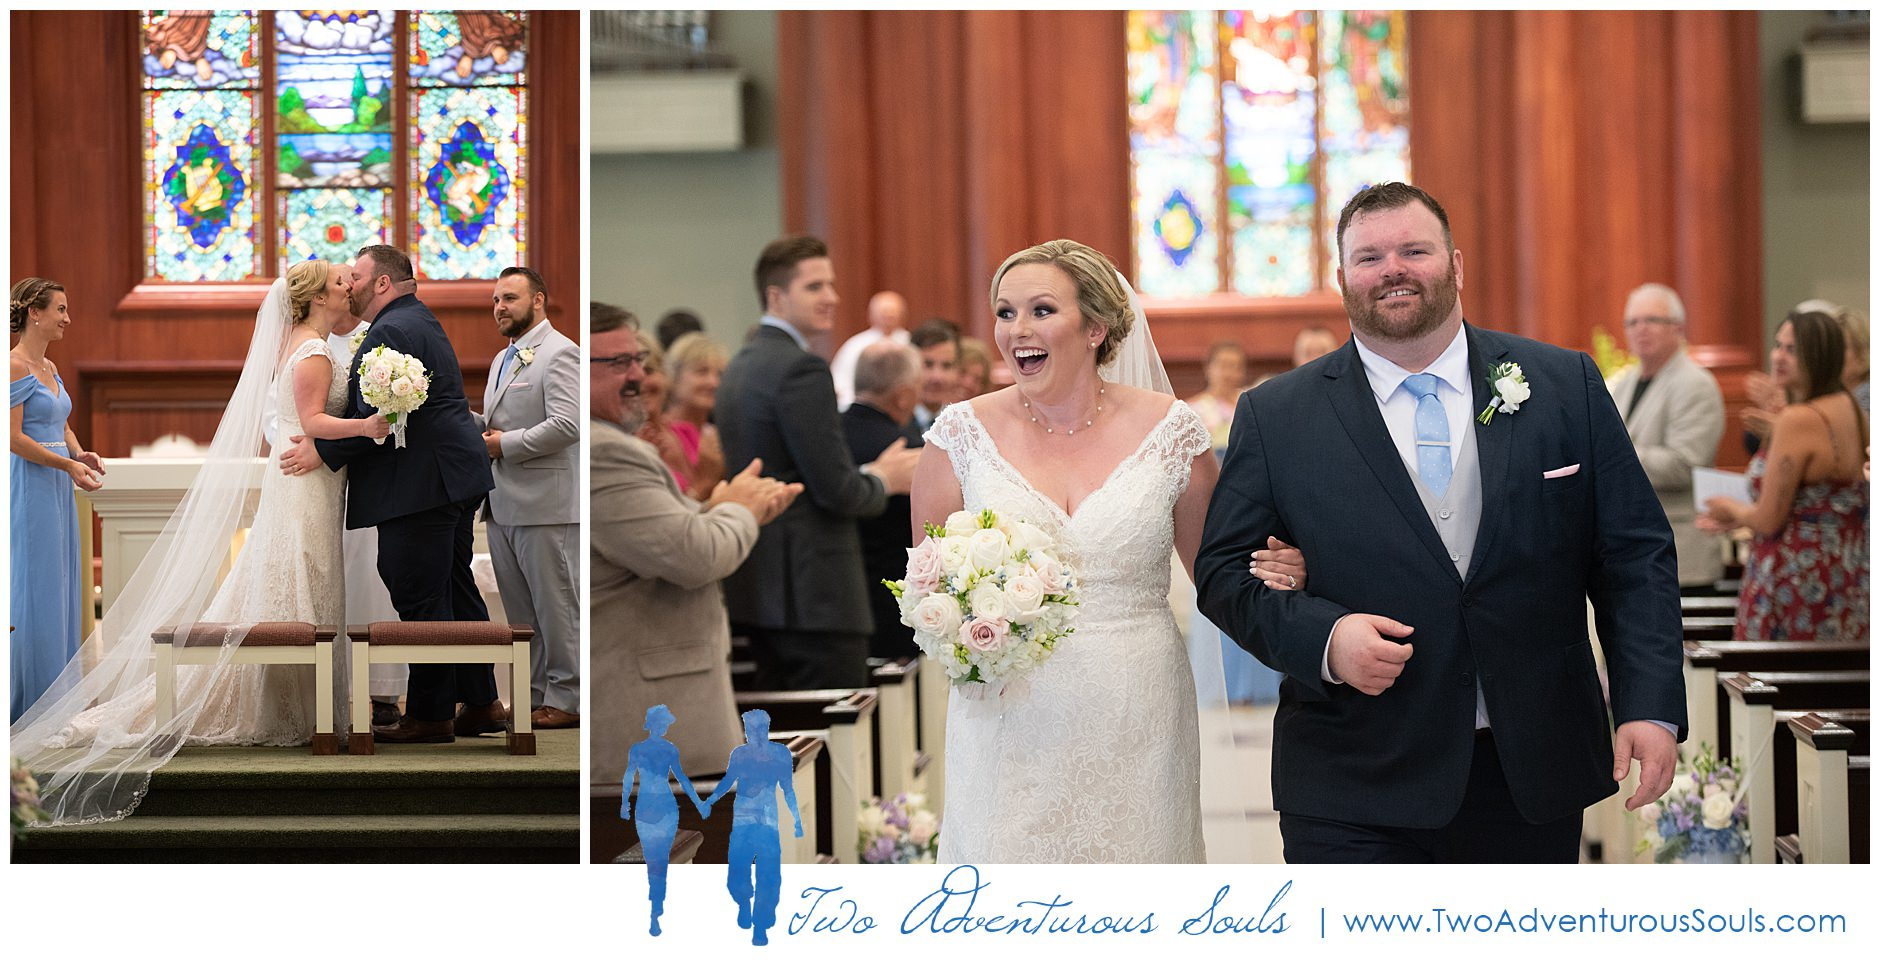 Cape Cod Wedding Photographers, Destination Wedding Photographers, Two Adventurous Souls-081019_0026.jpg